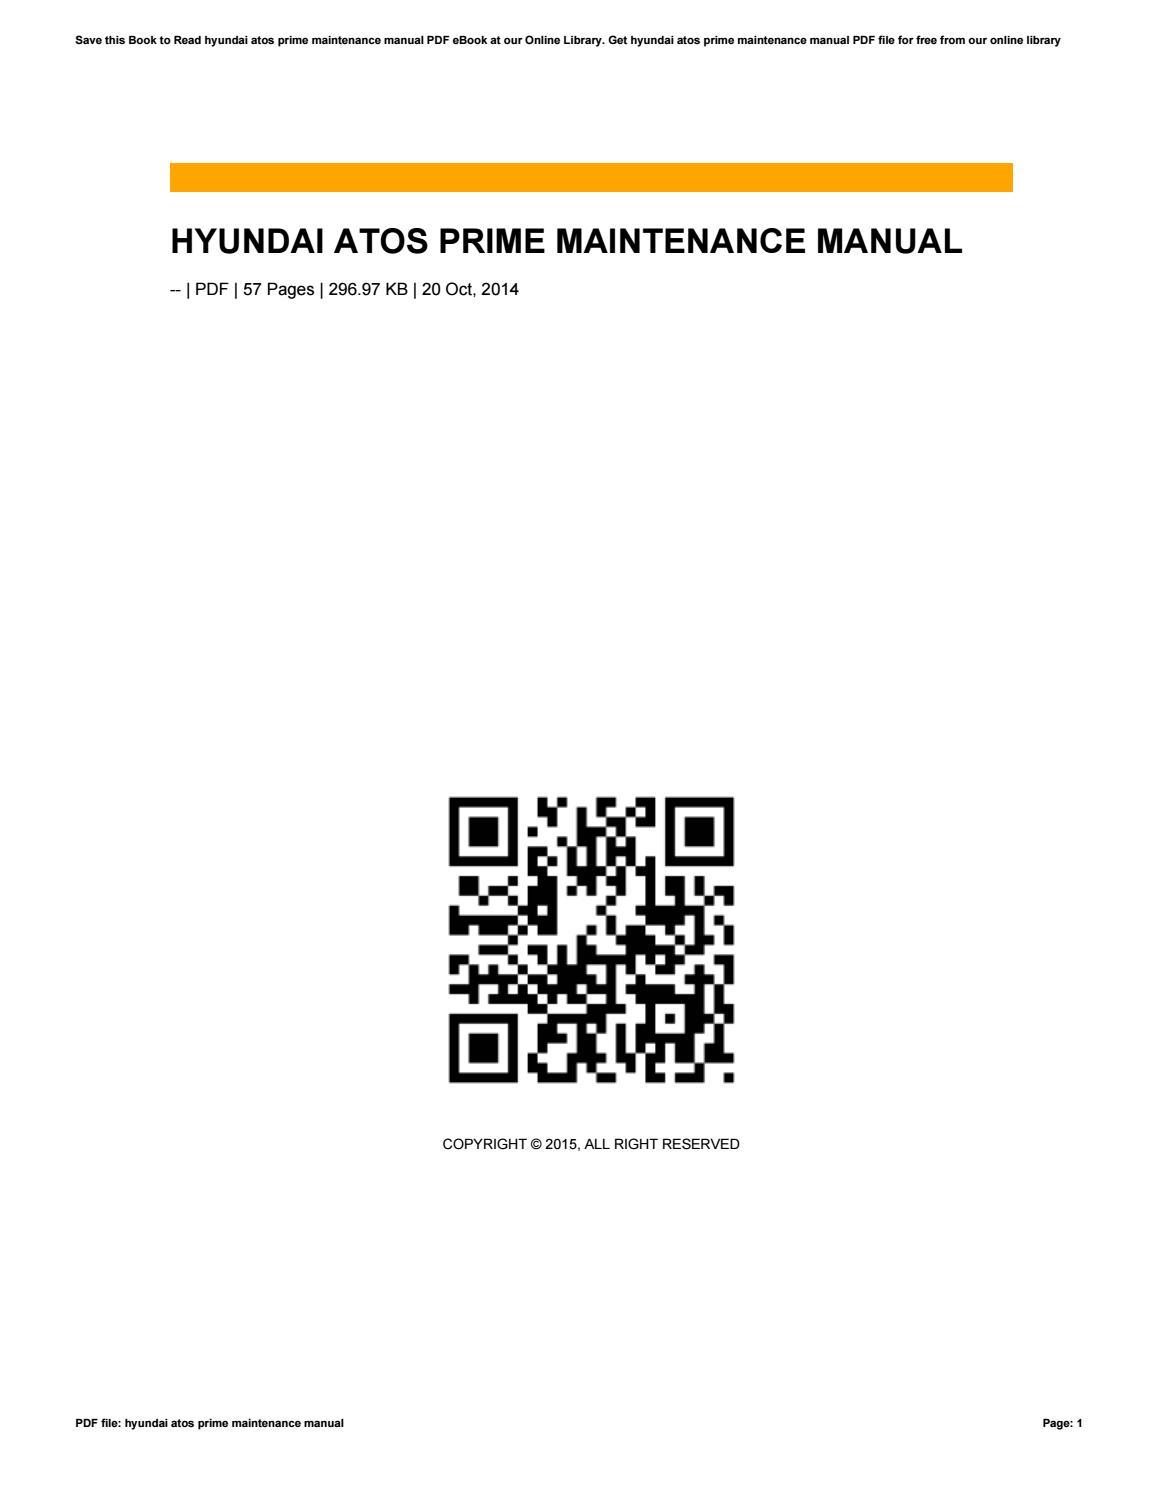 manual hyundai atos prime ebook rh manual hyundai atos prime ebook tempower us 2006 Hyundai Atos Prime hyundai atos prime repair manual